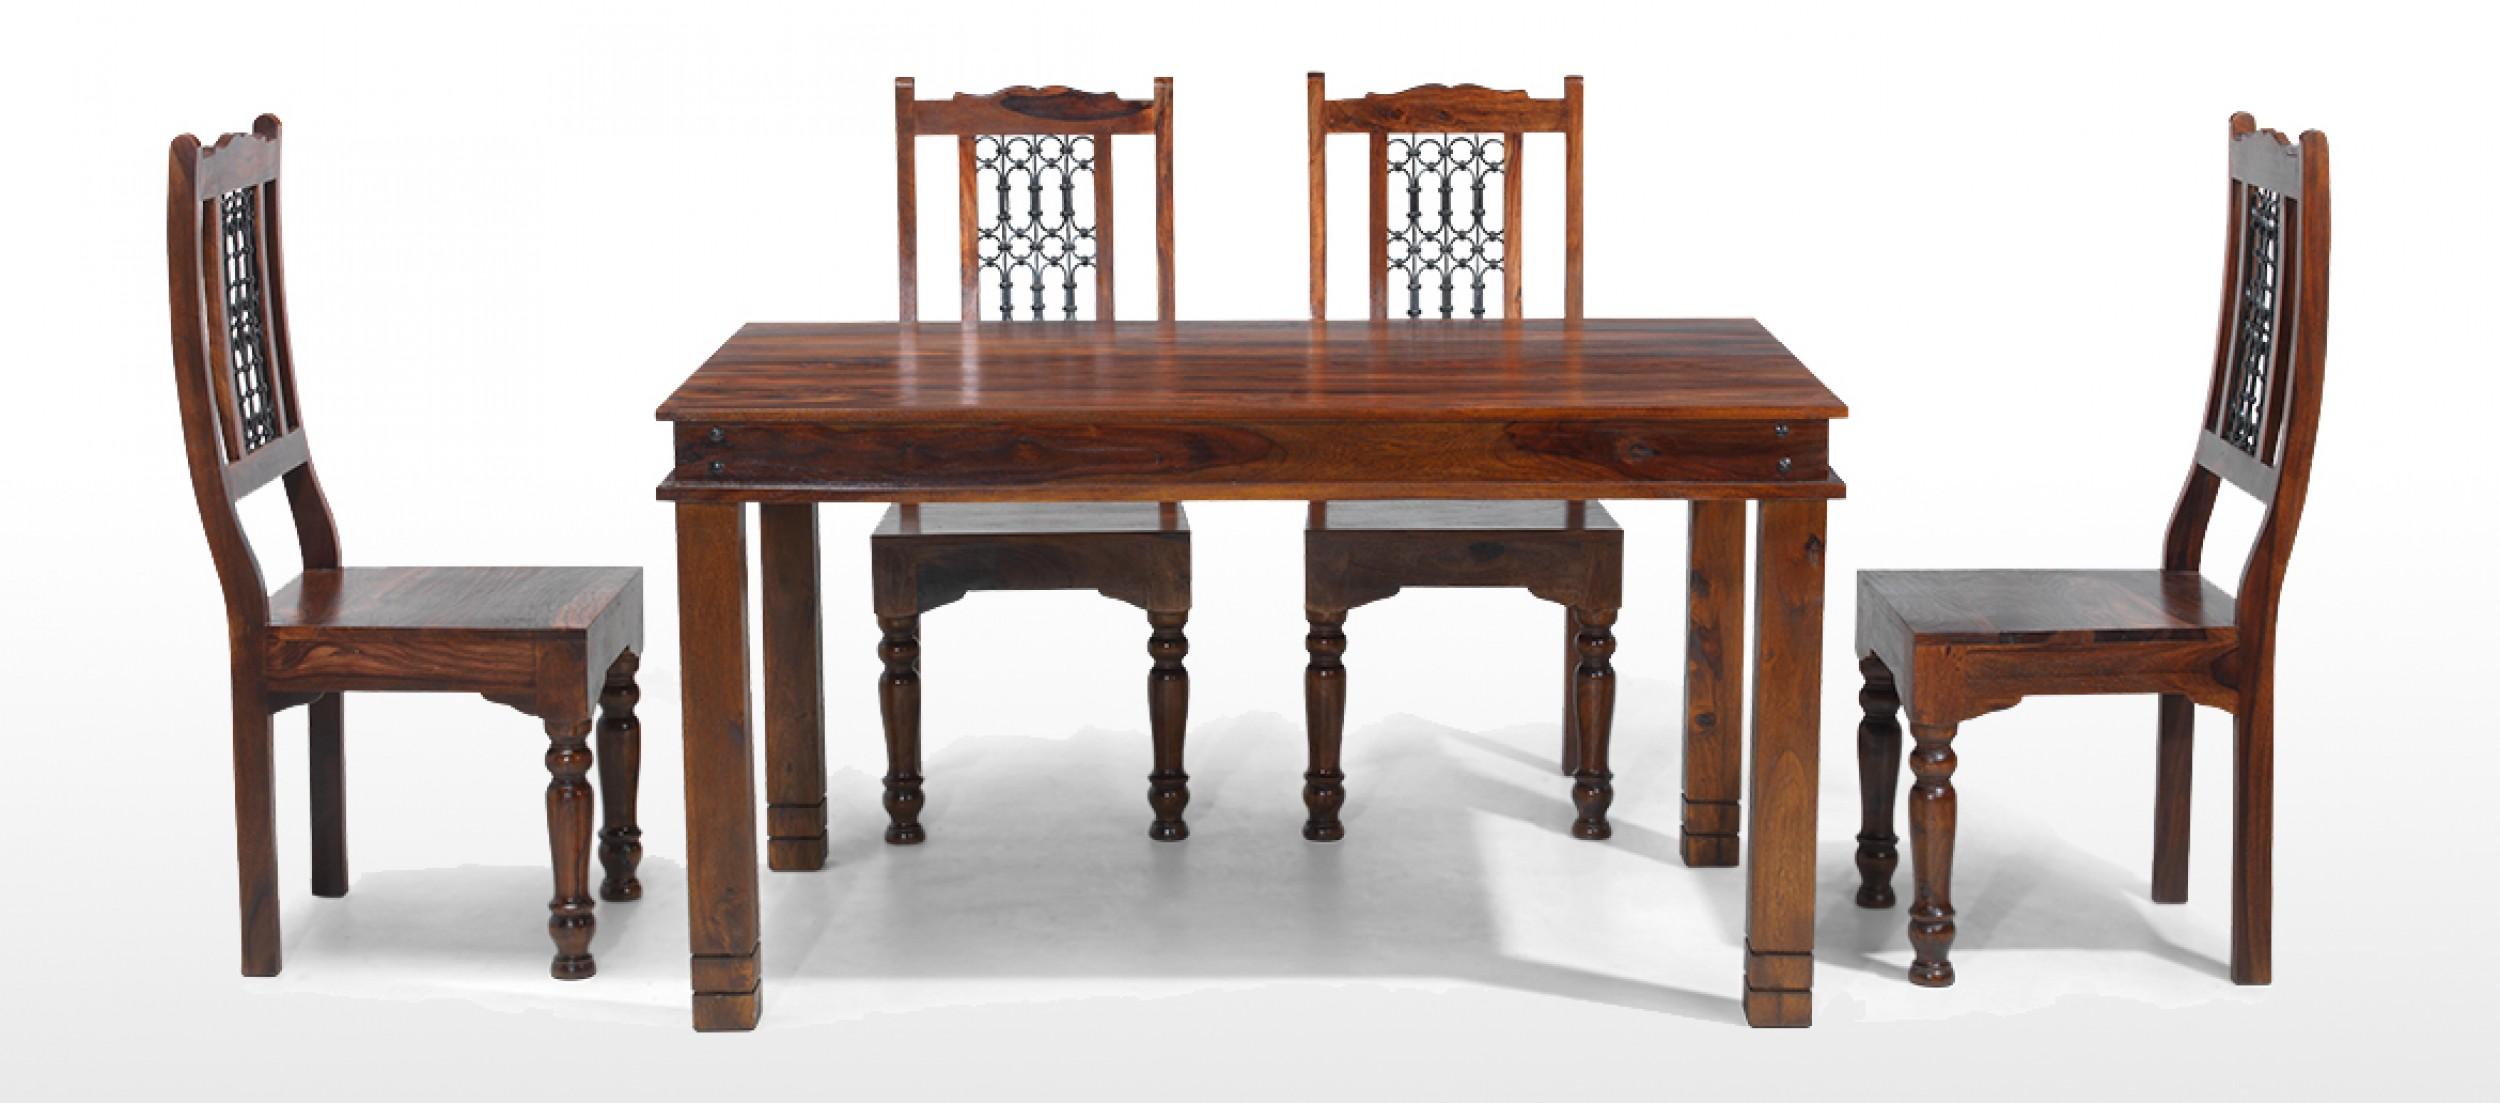 Jaipur Sheesham Dining Table 4 Chairs J D Williams  : jali sheesham thakat dining table set sh 17 set 4 front from honansantiques.com size 2500 x 1103 jpeg 283kB